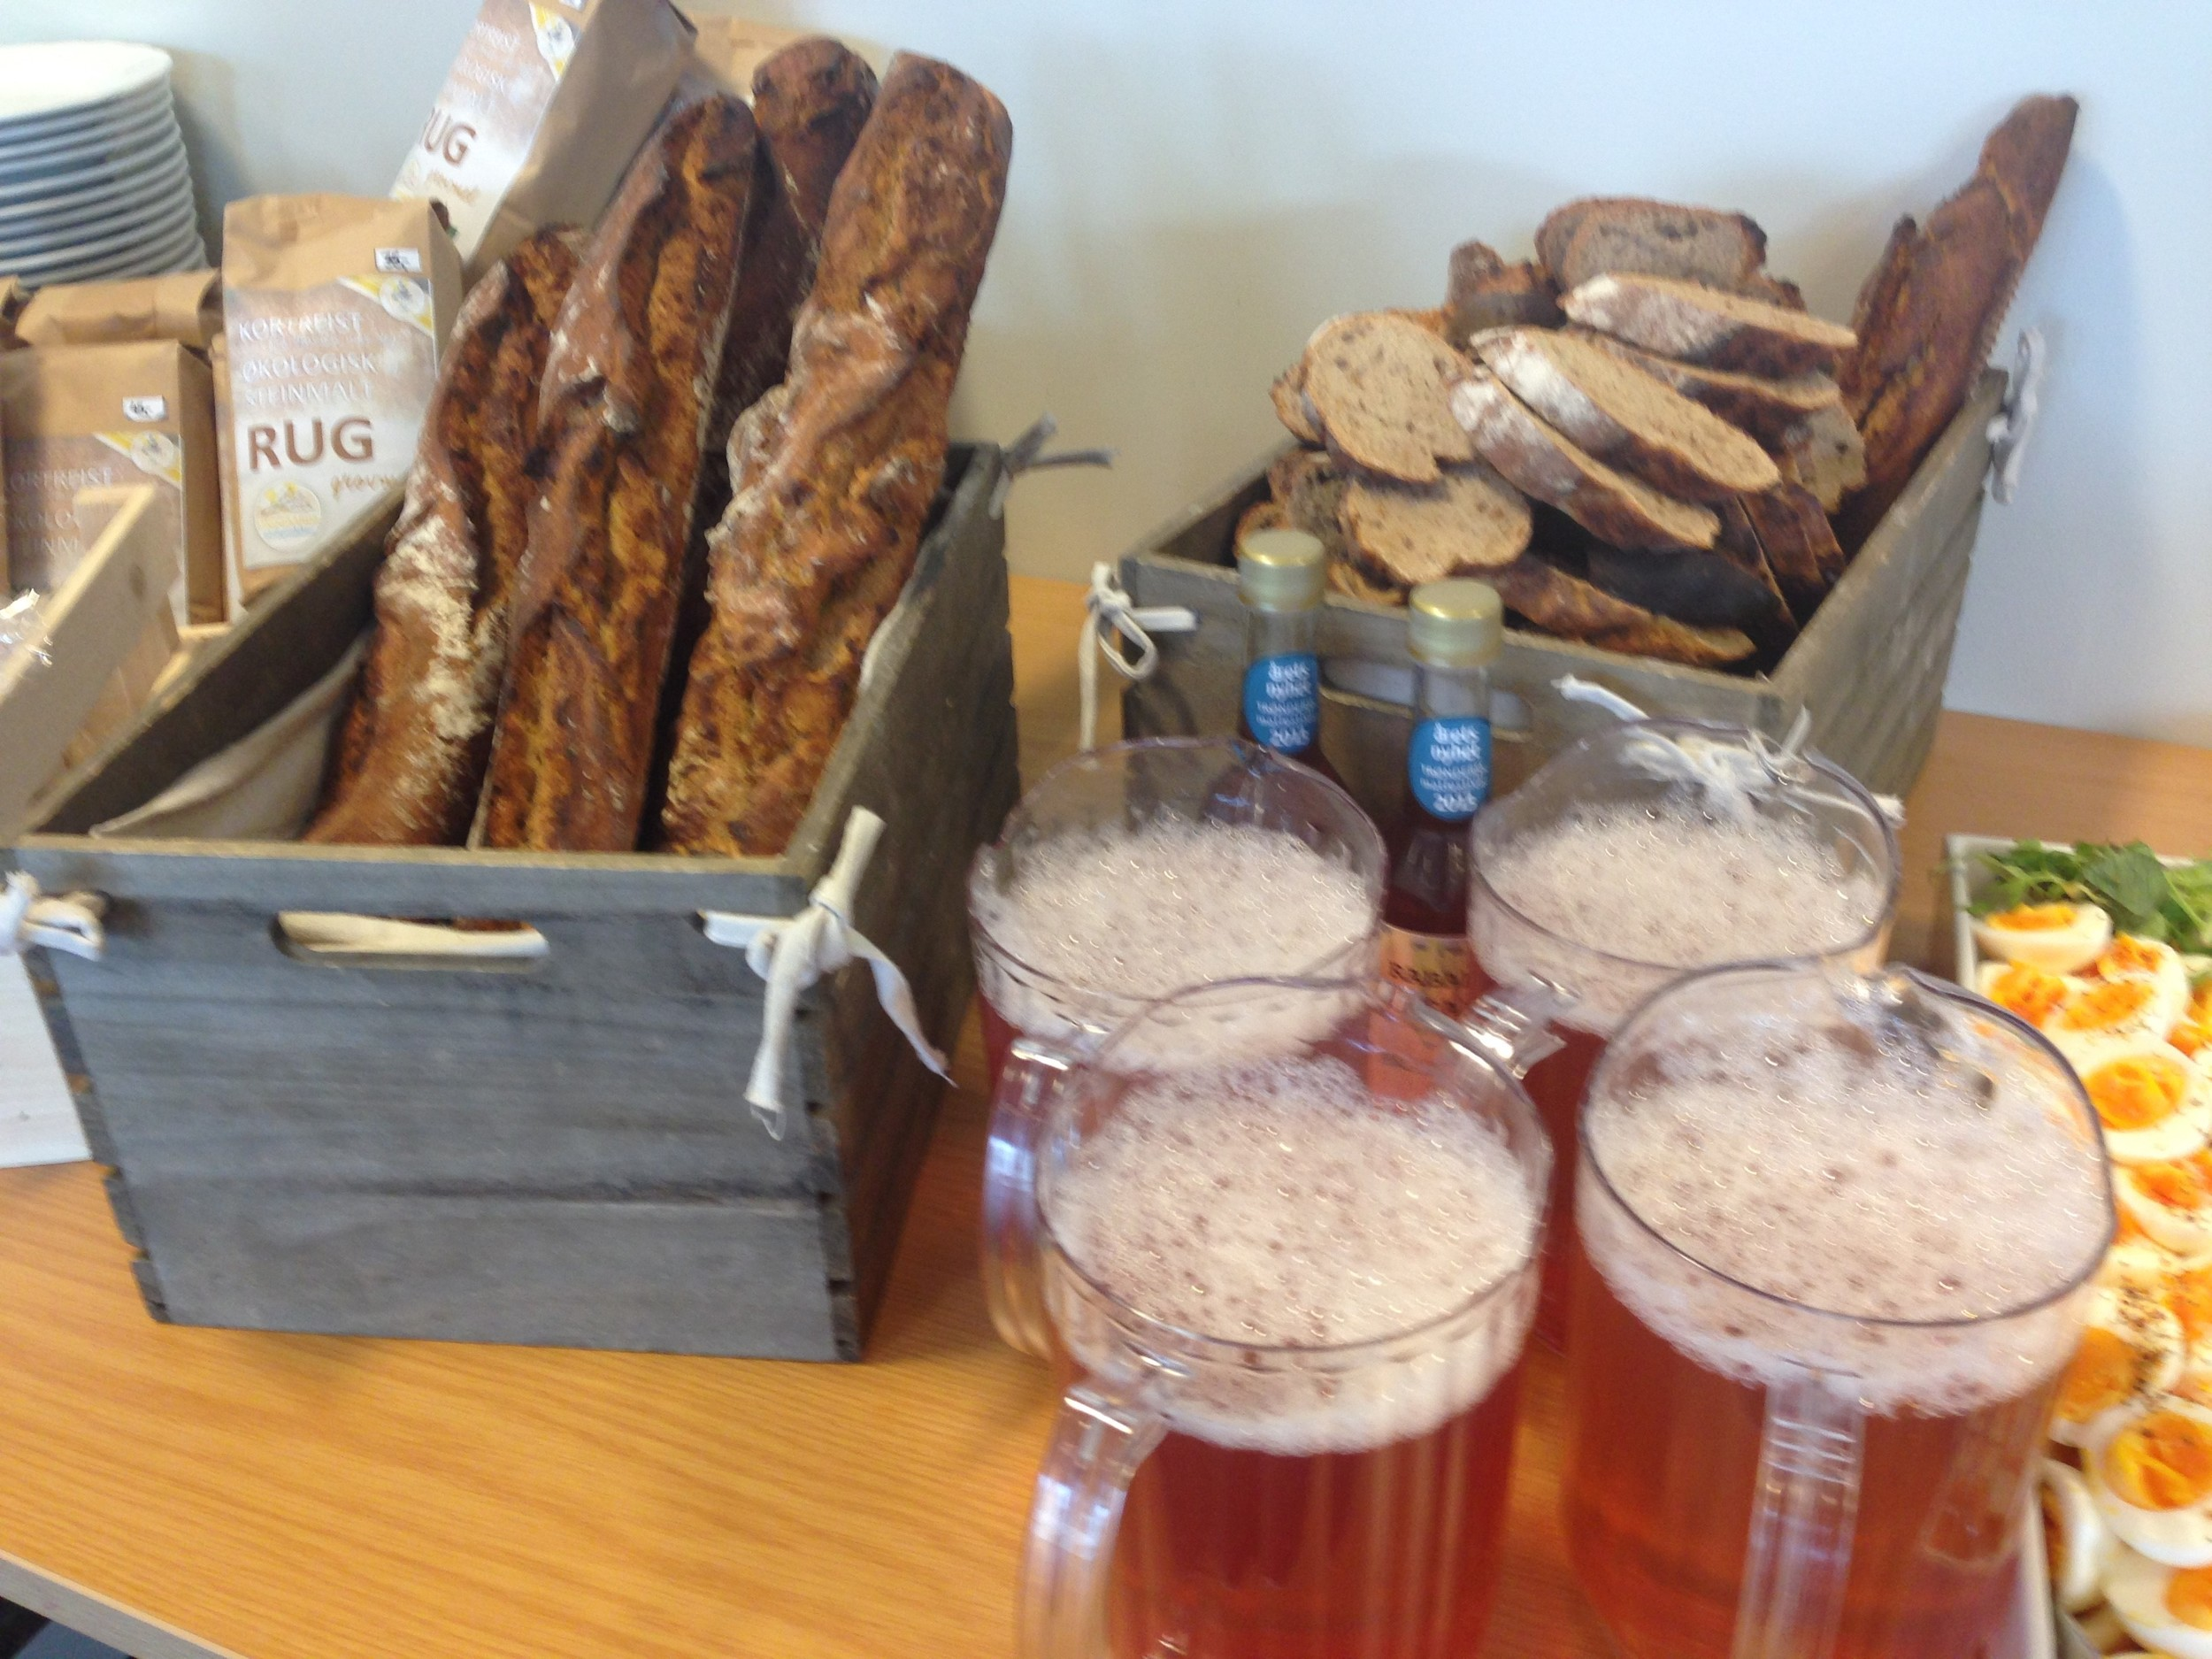 Surdeigs bagetter på lokalt mel og rabarbrasaft